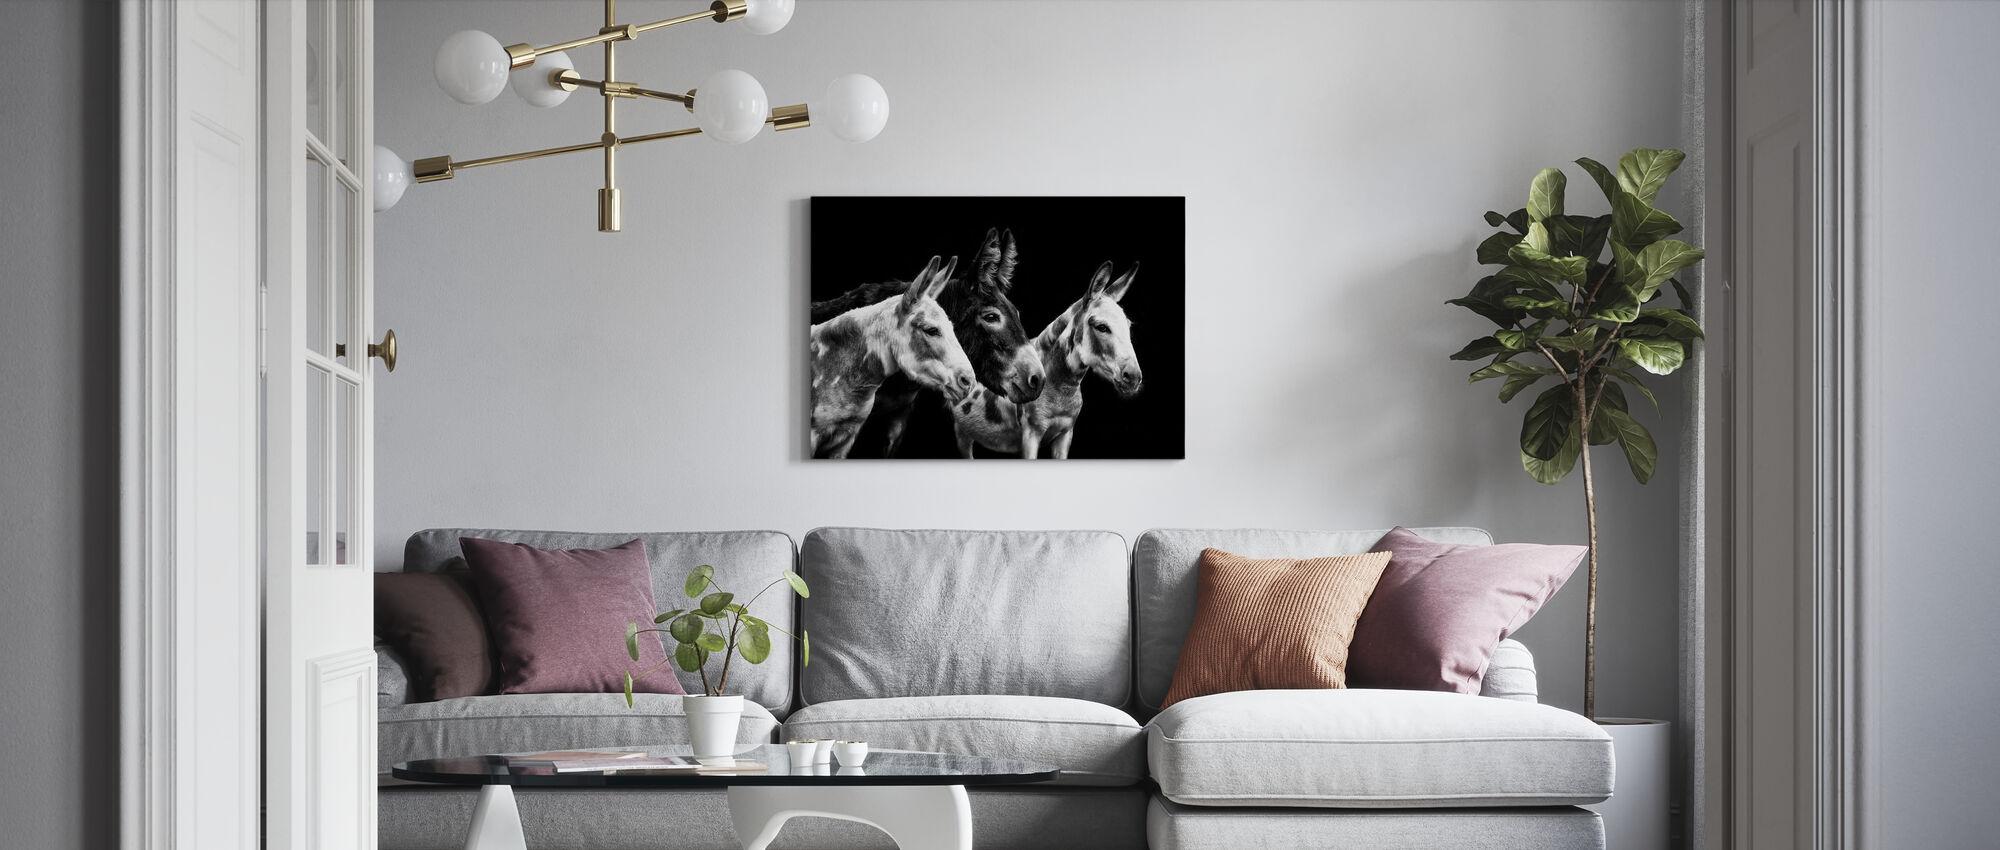 Esel Portrett II - Lerretsbilde - Stue